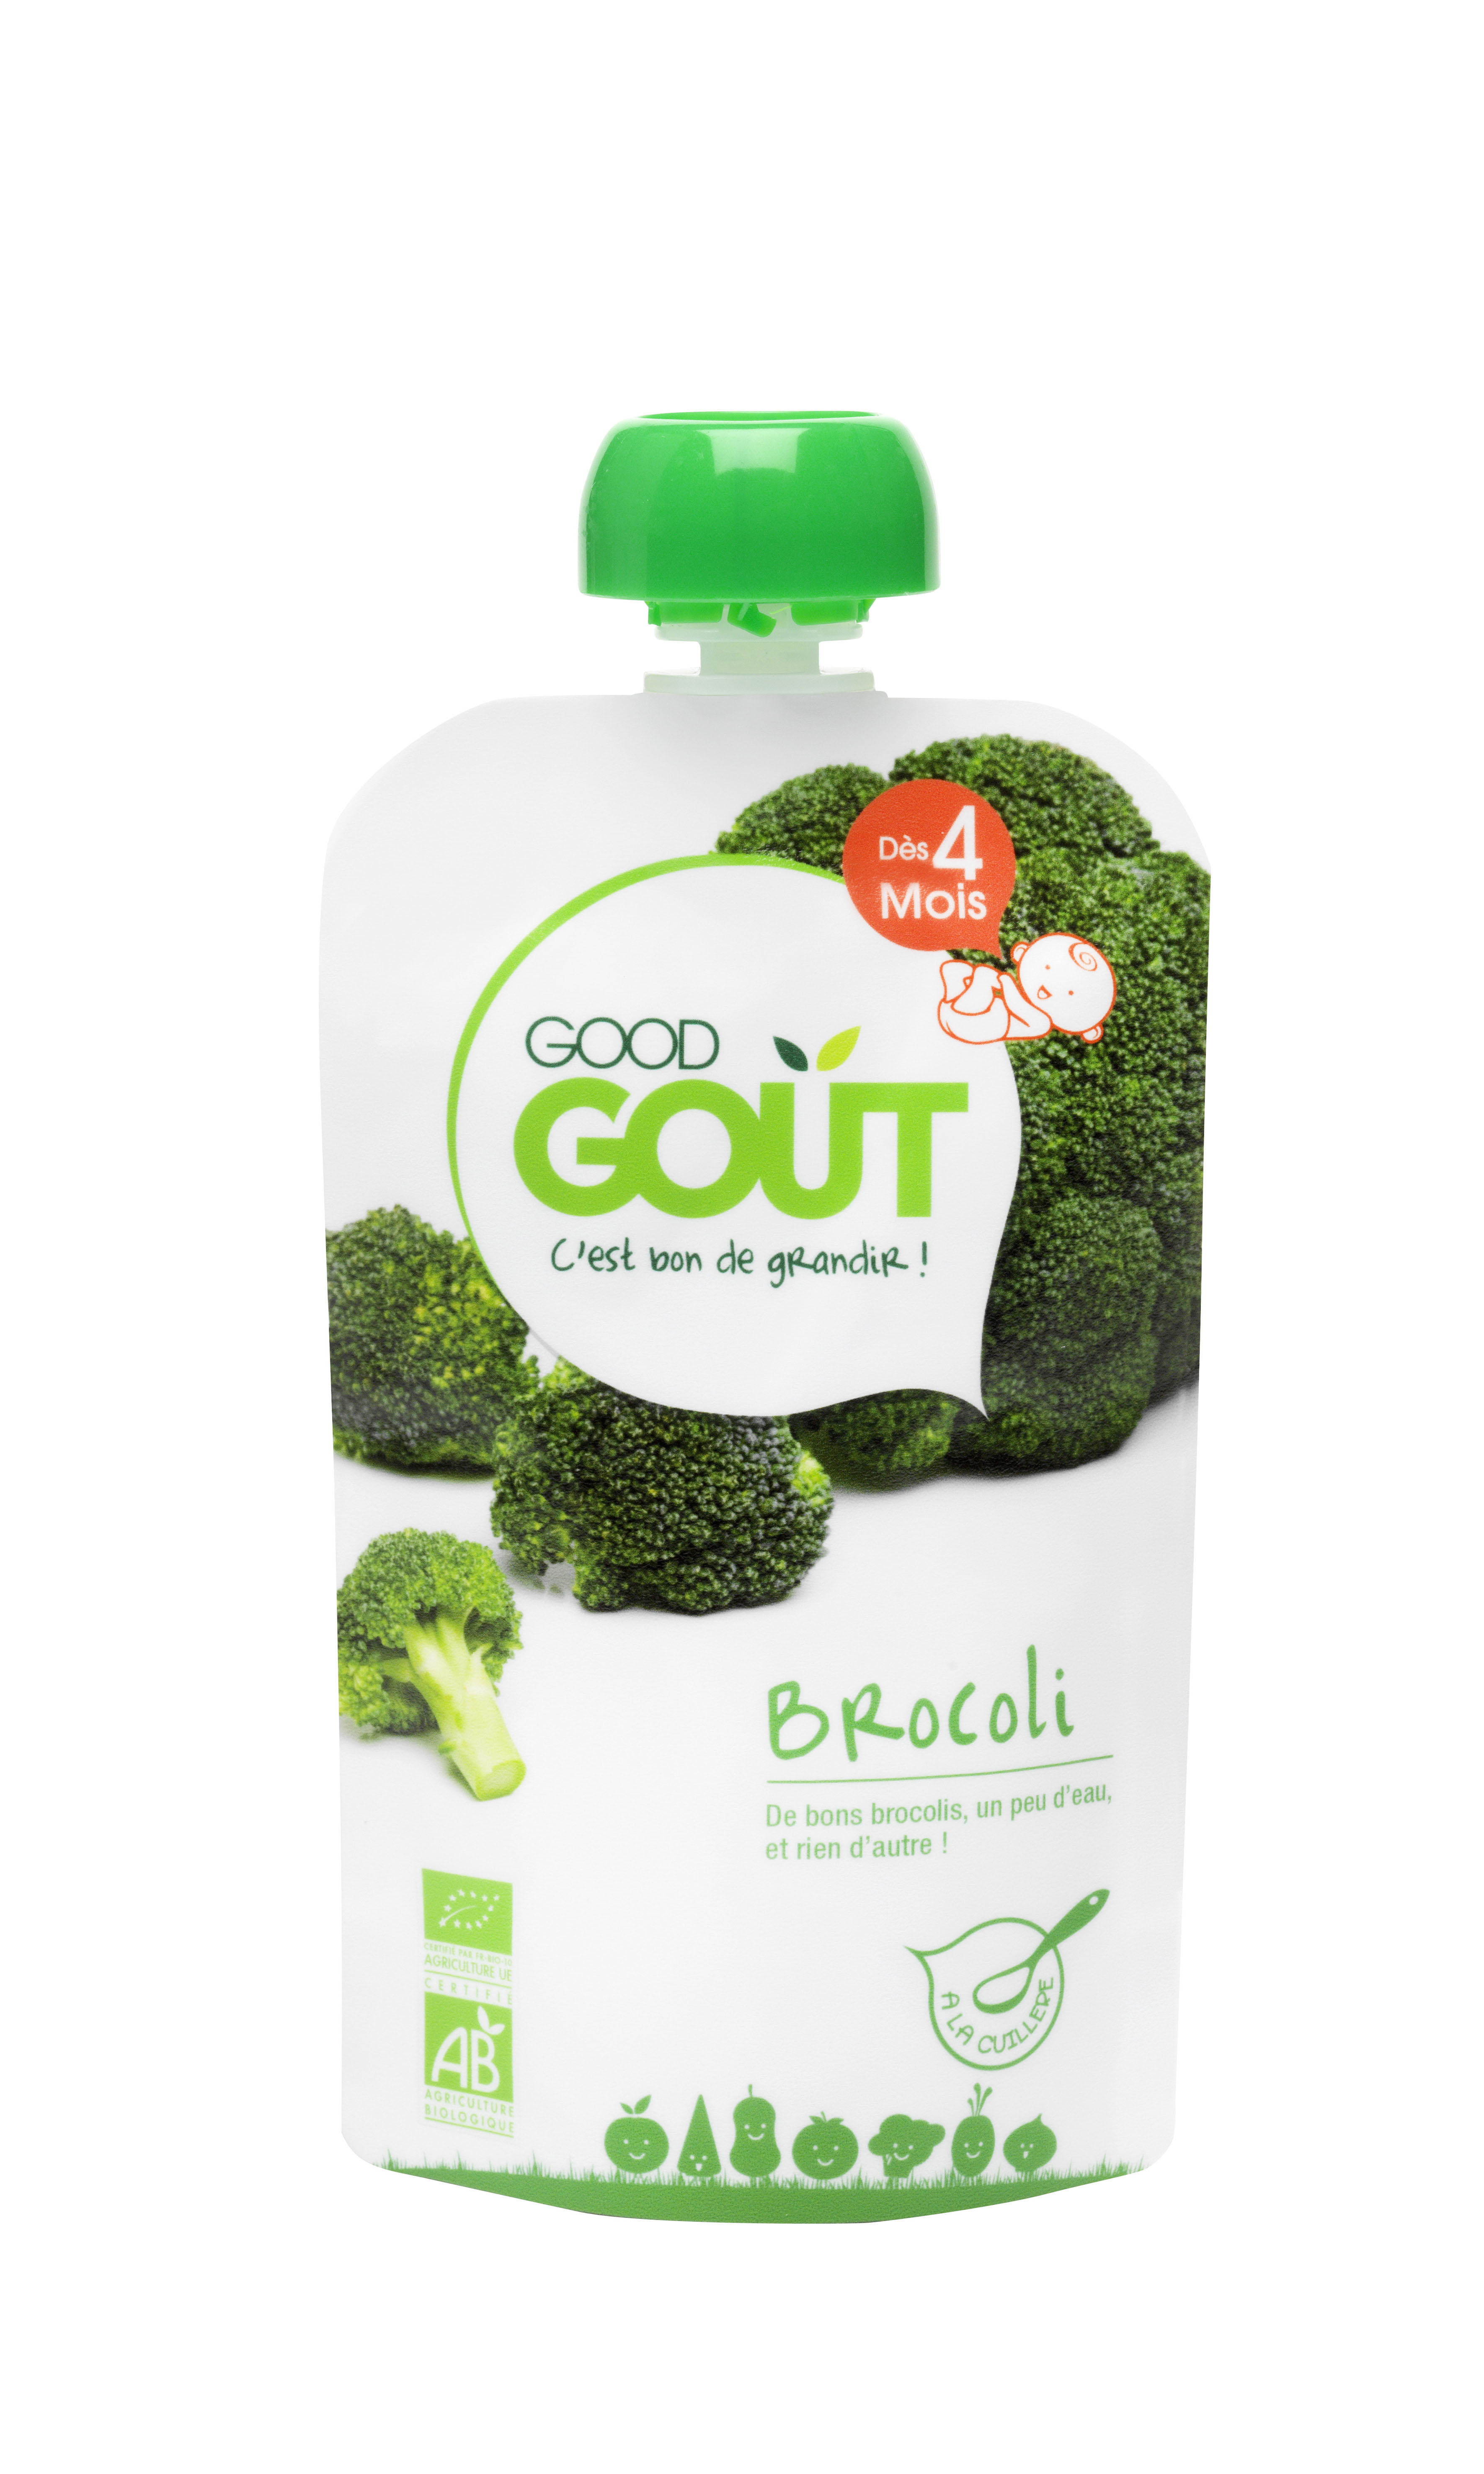 Good Gourde Brocoli BIO, Good Goût (120 g) - dès 4 mois